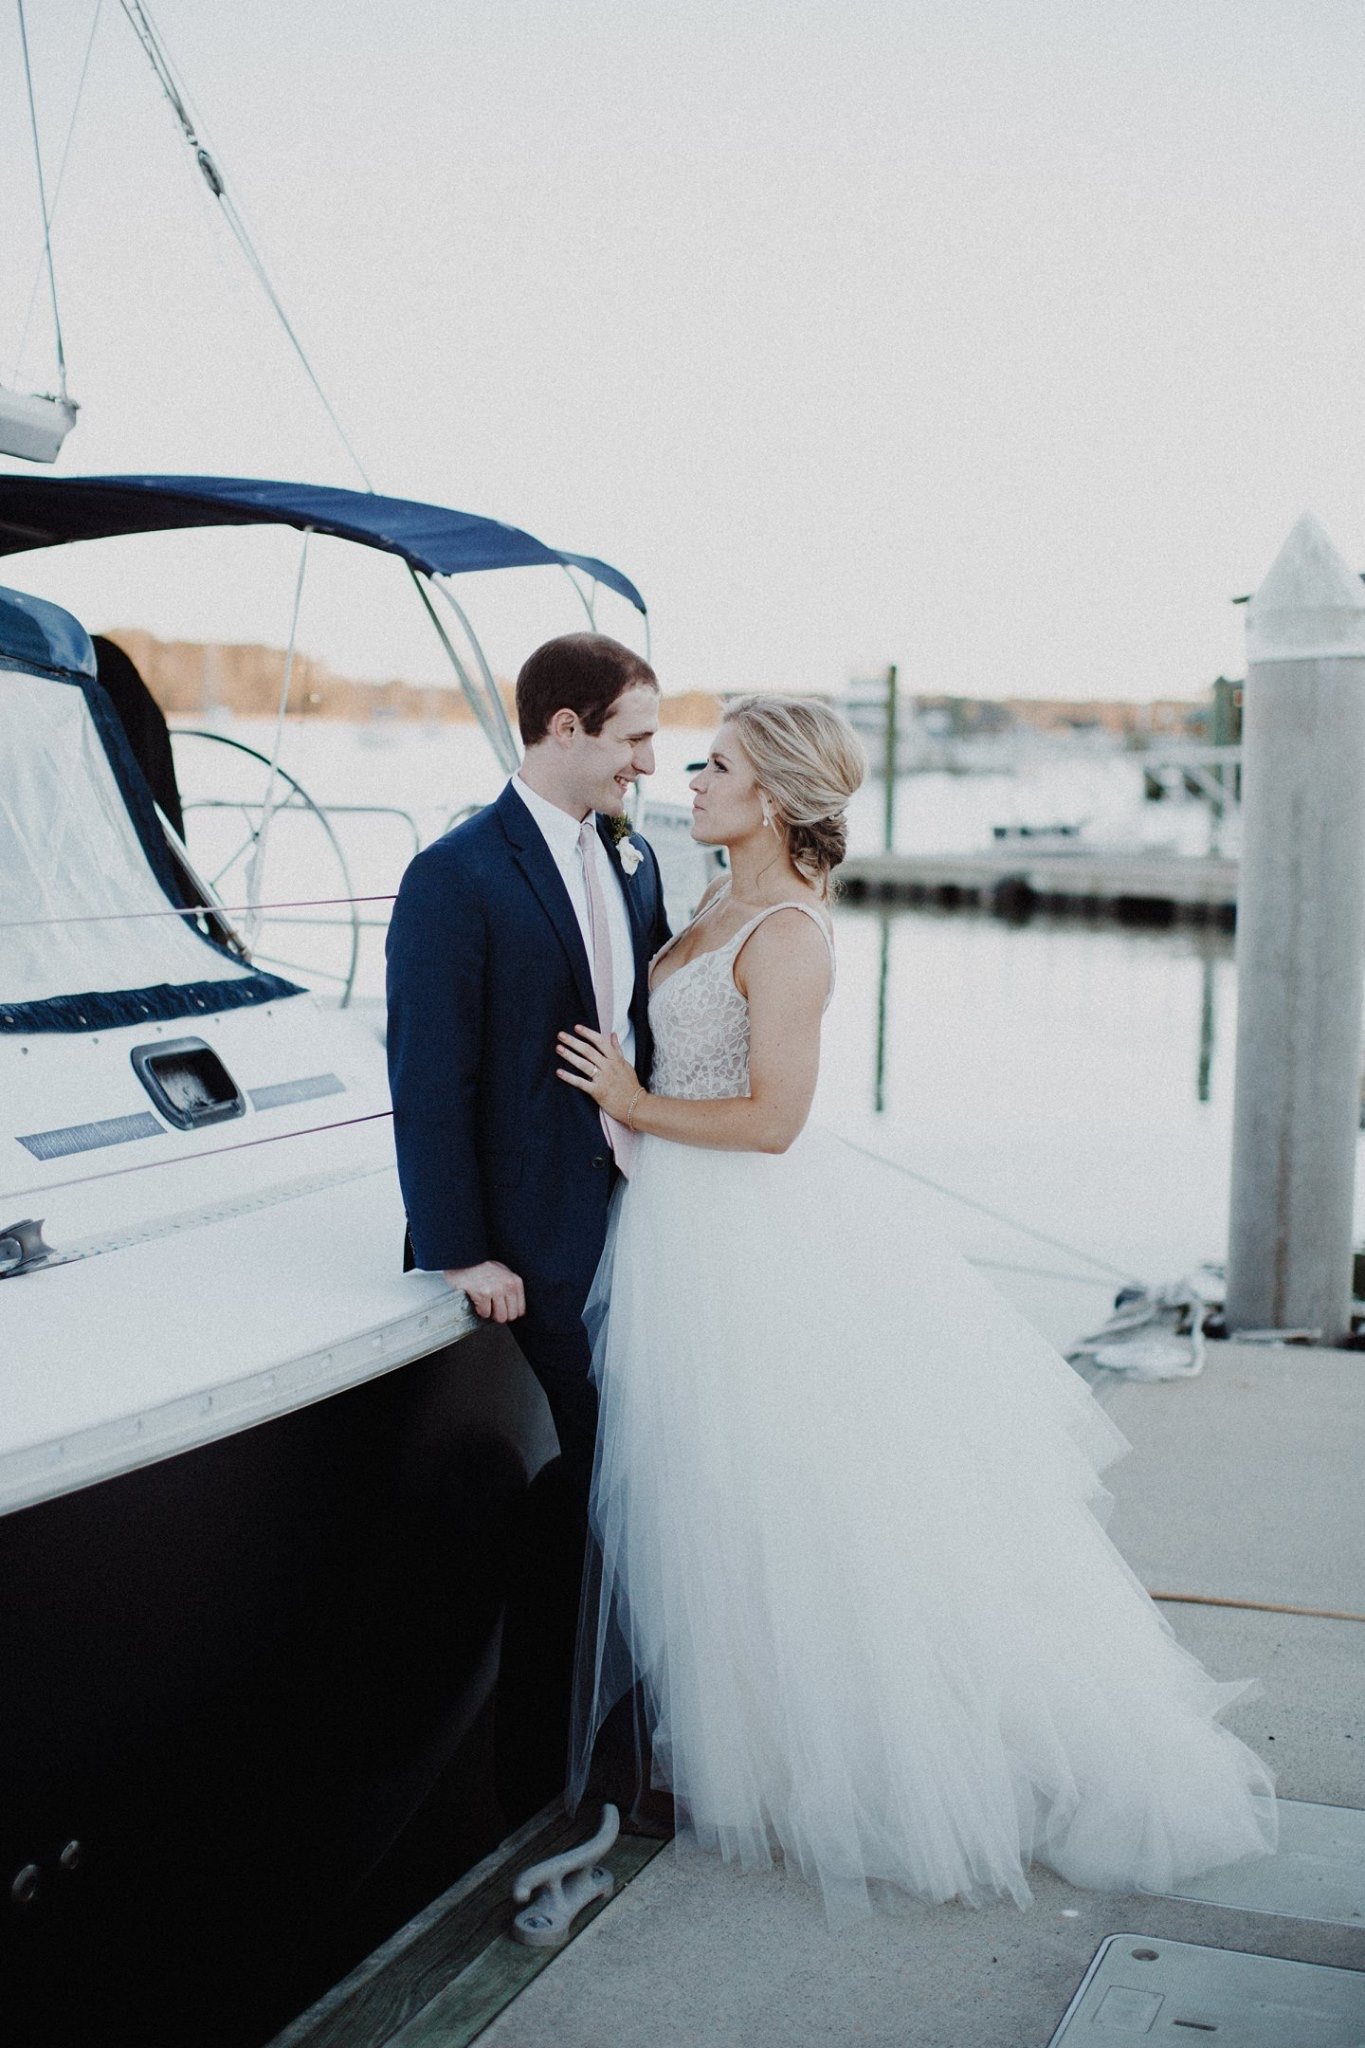 DANIELLE'S INCREDIBLE WEDDING AT THE ISLE OF HOPE MARINA